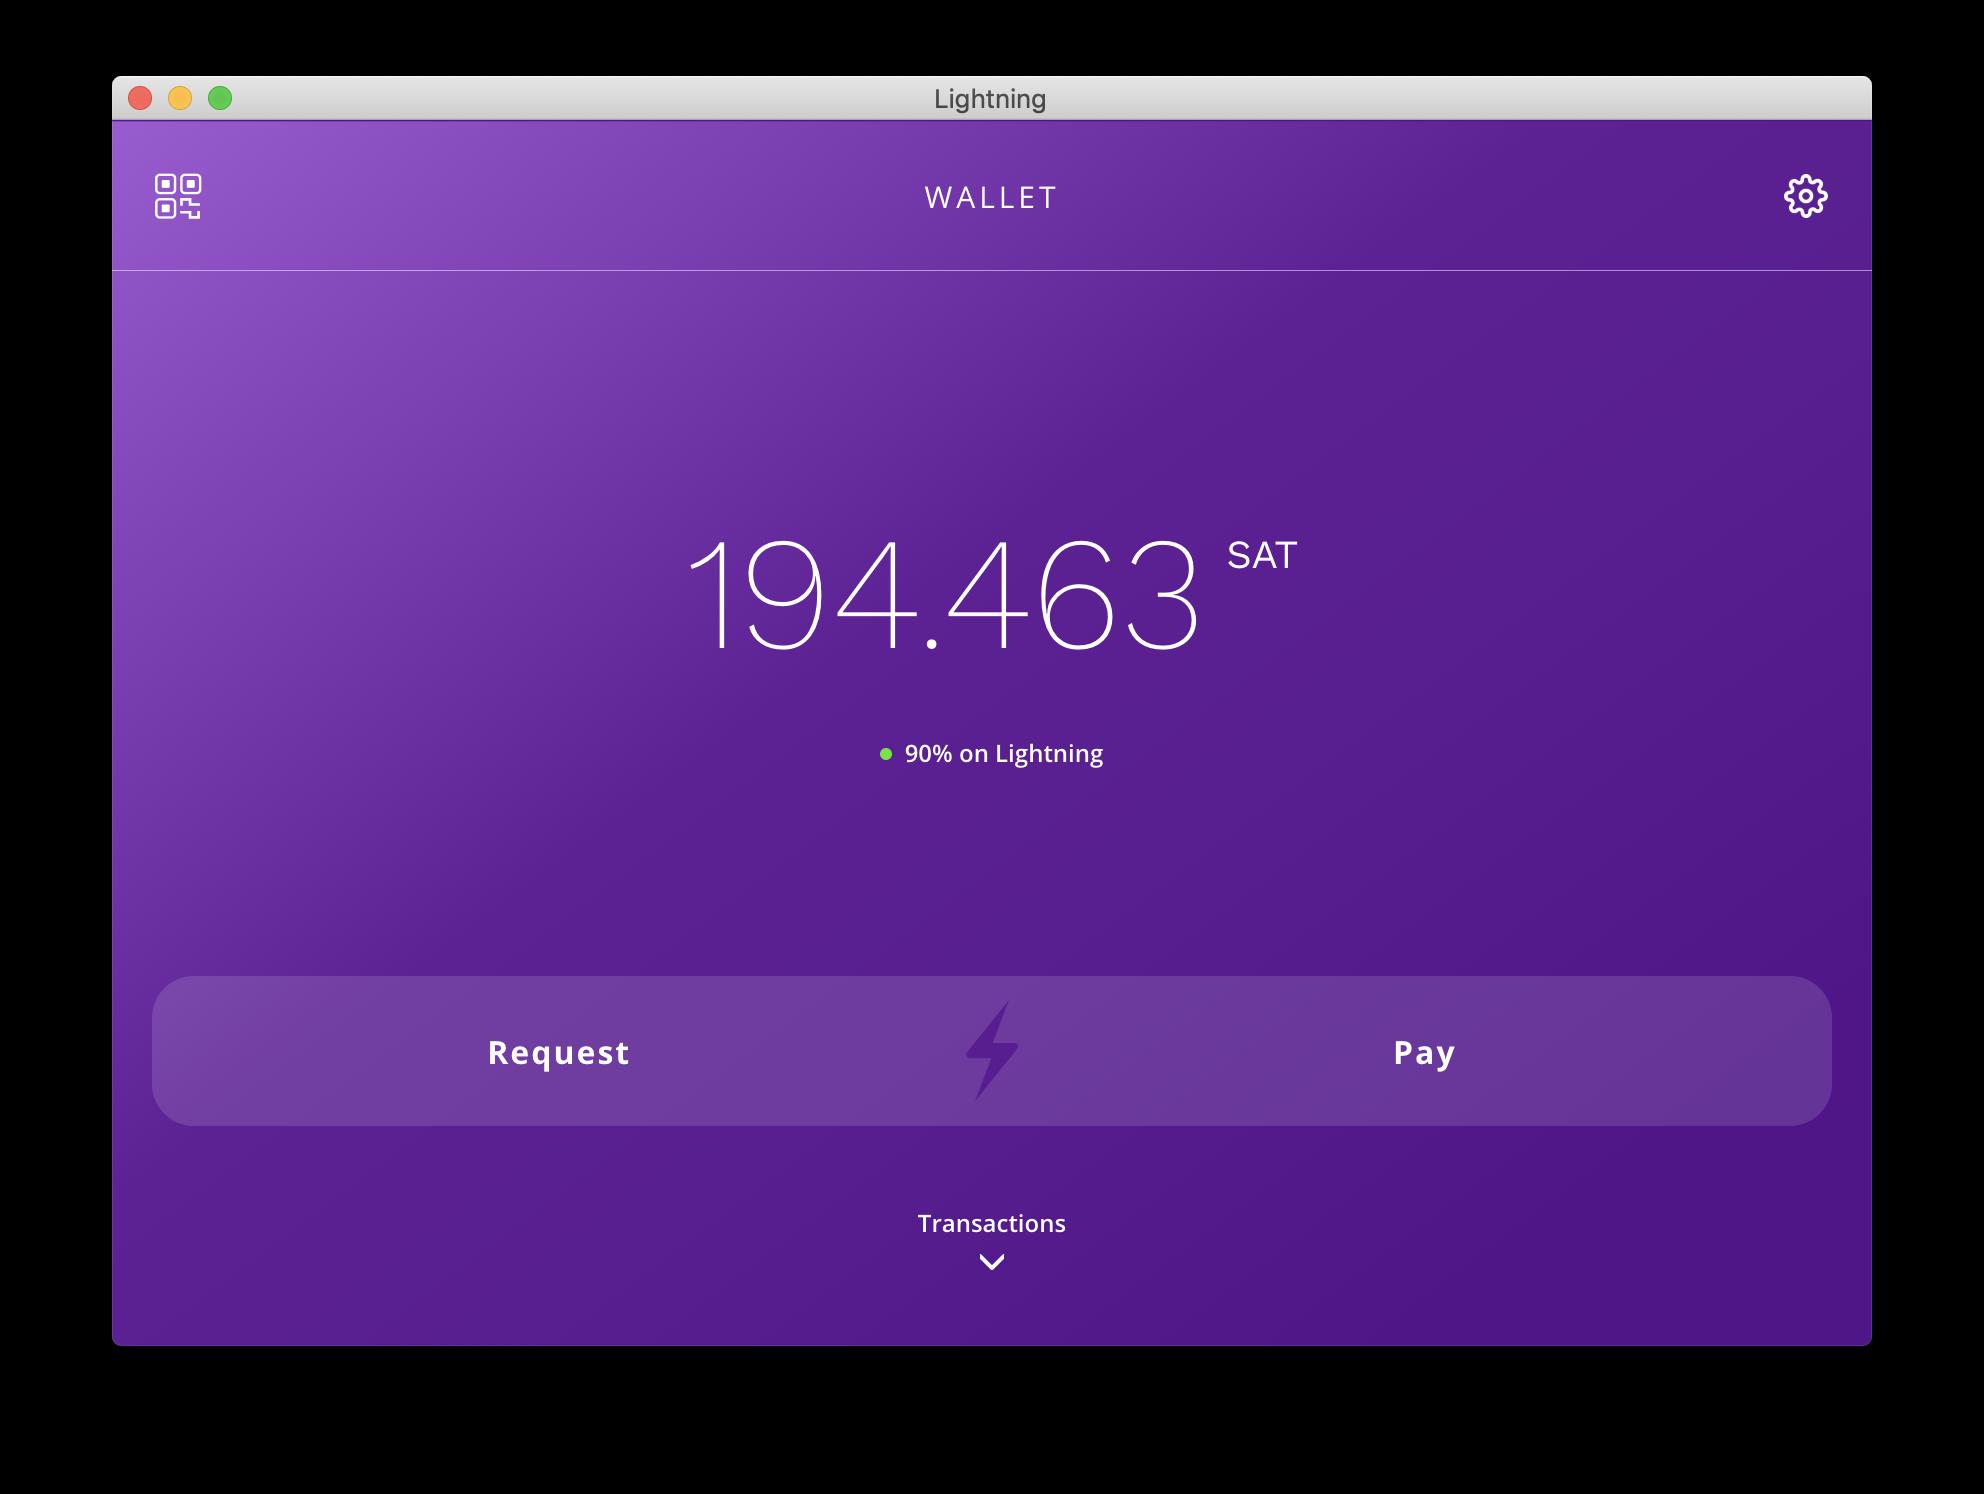 Screenshot of Lightning Desktop App Channel View